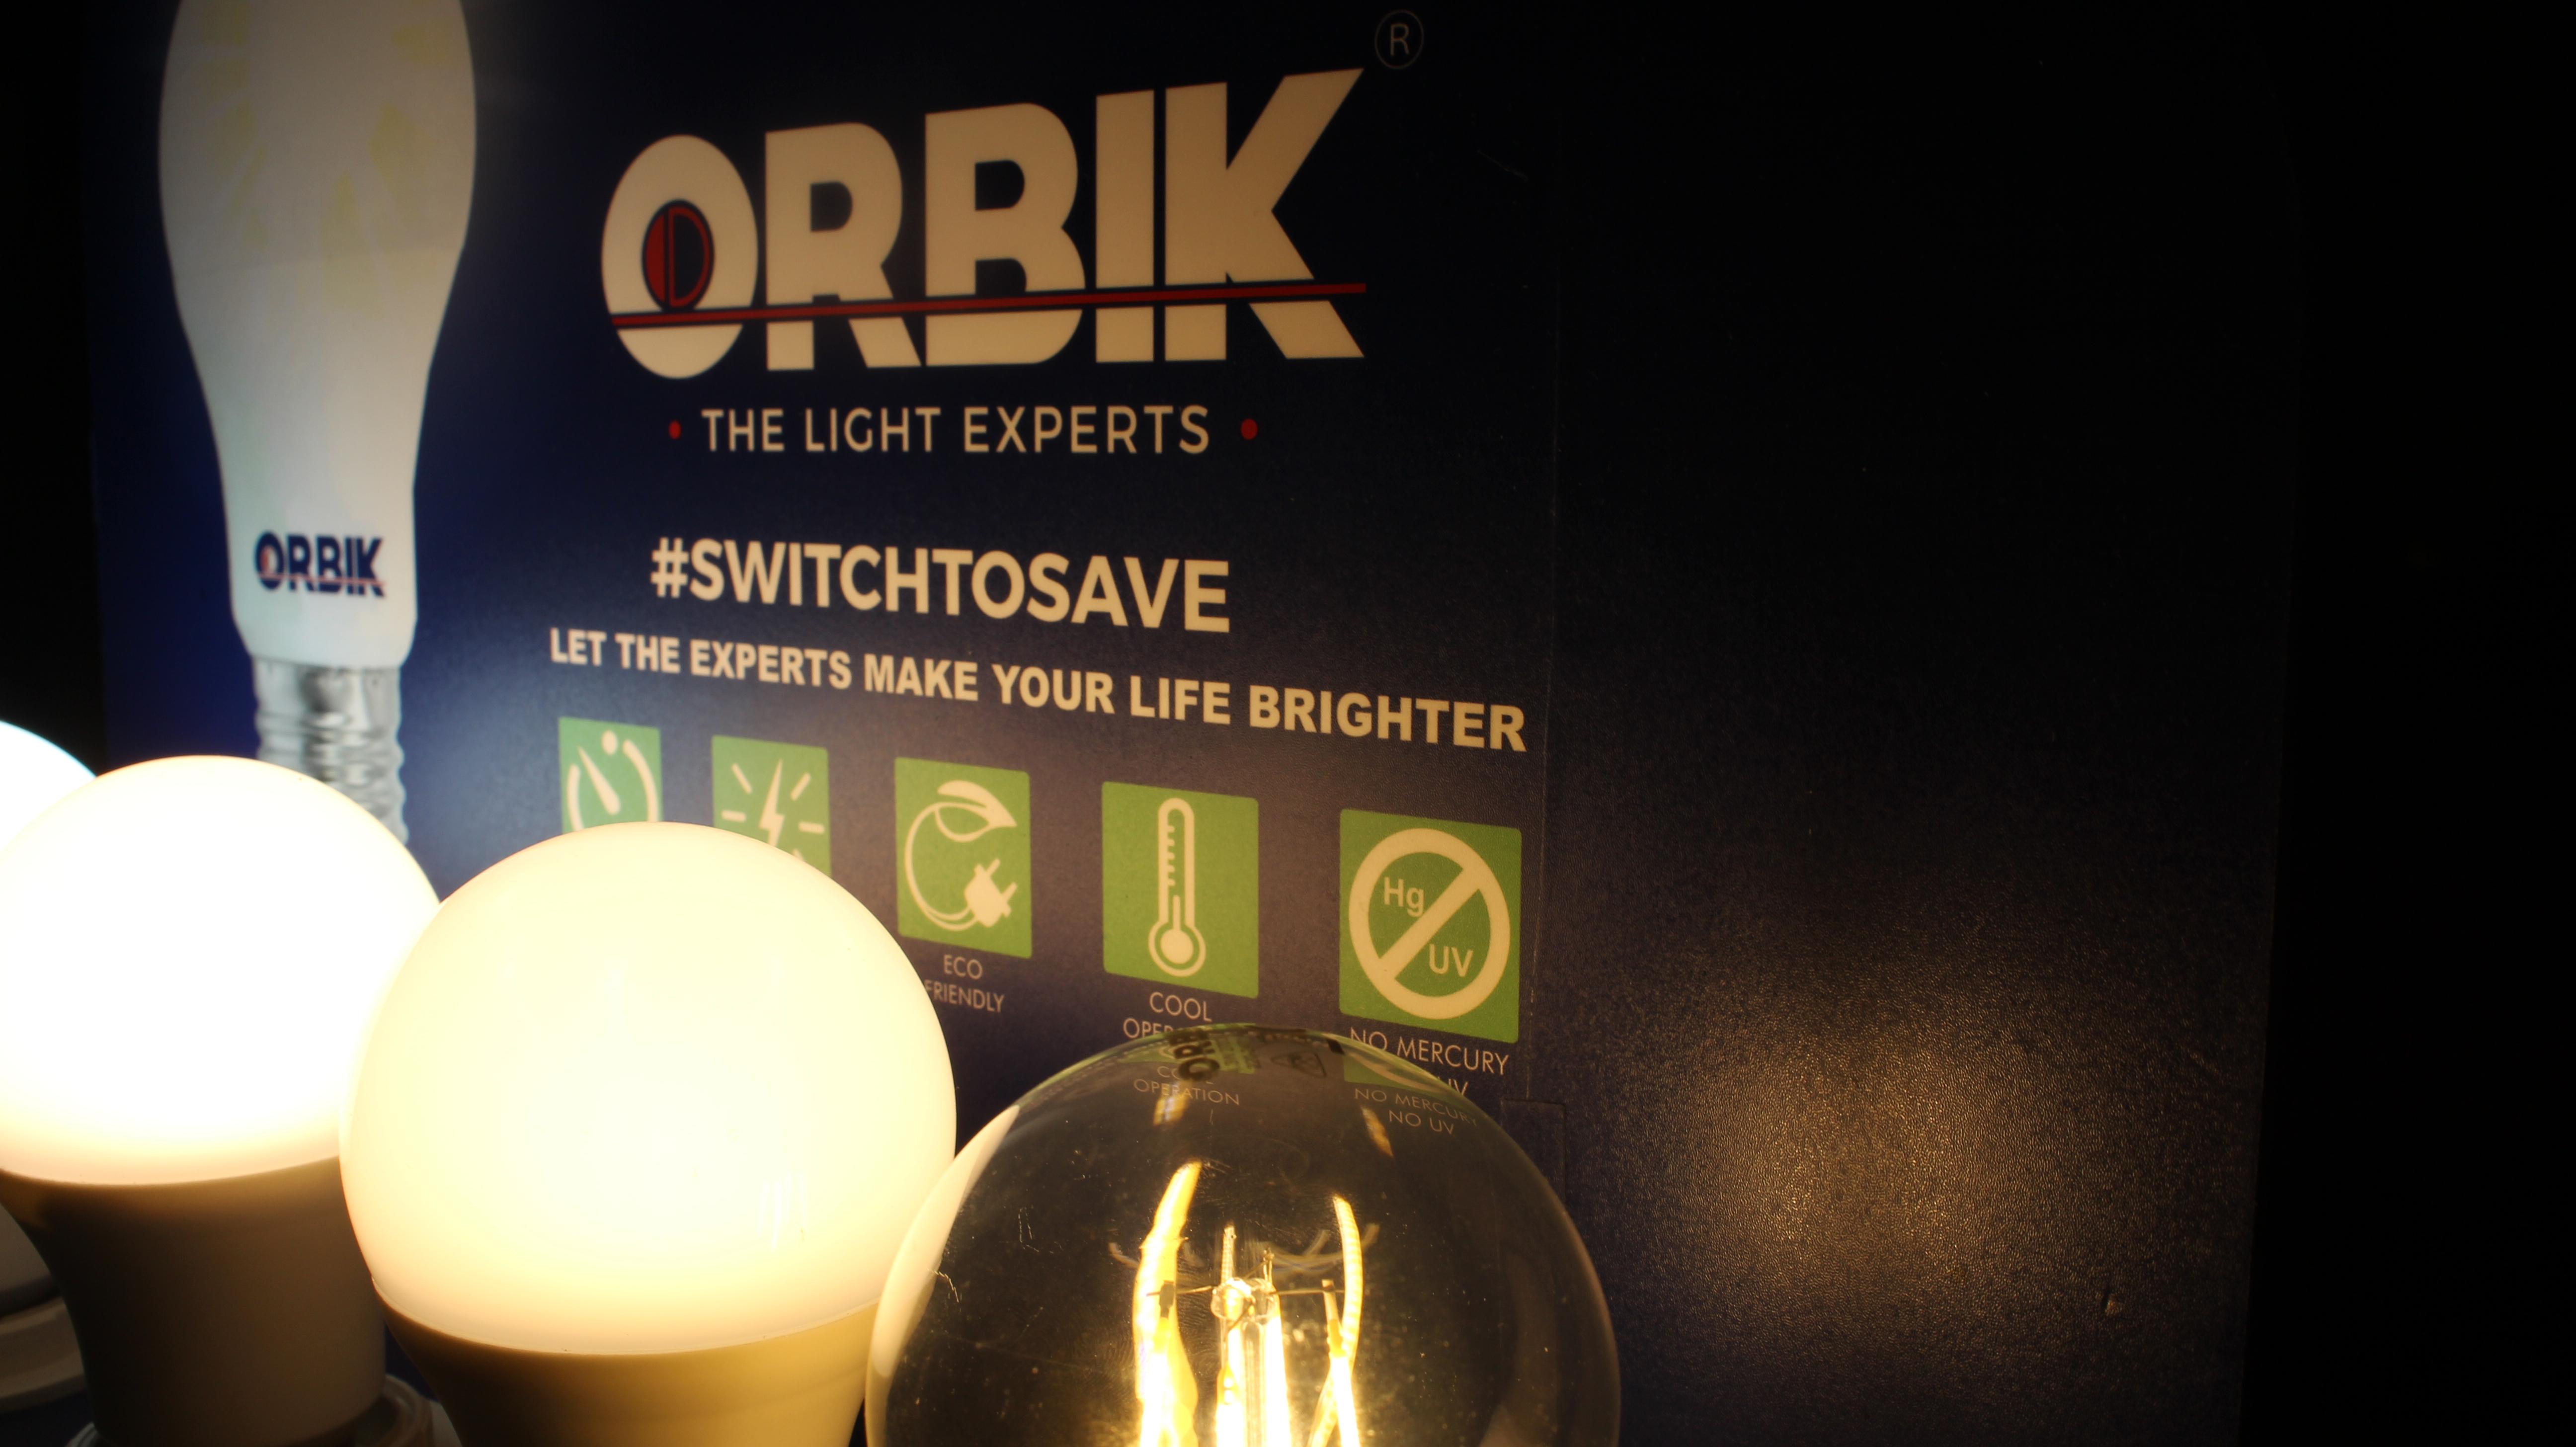 orbik lighting philippines walsall orbik lighting up your home without burning budget orbik led light